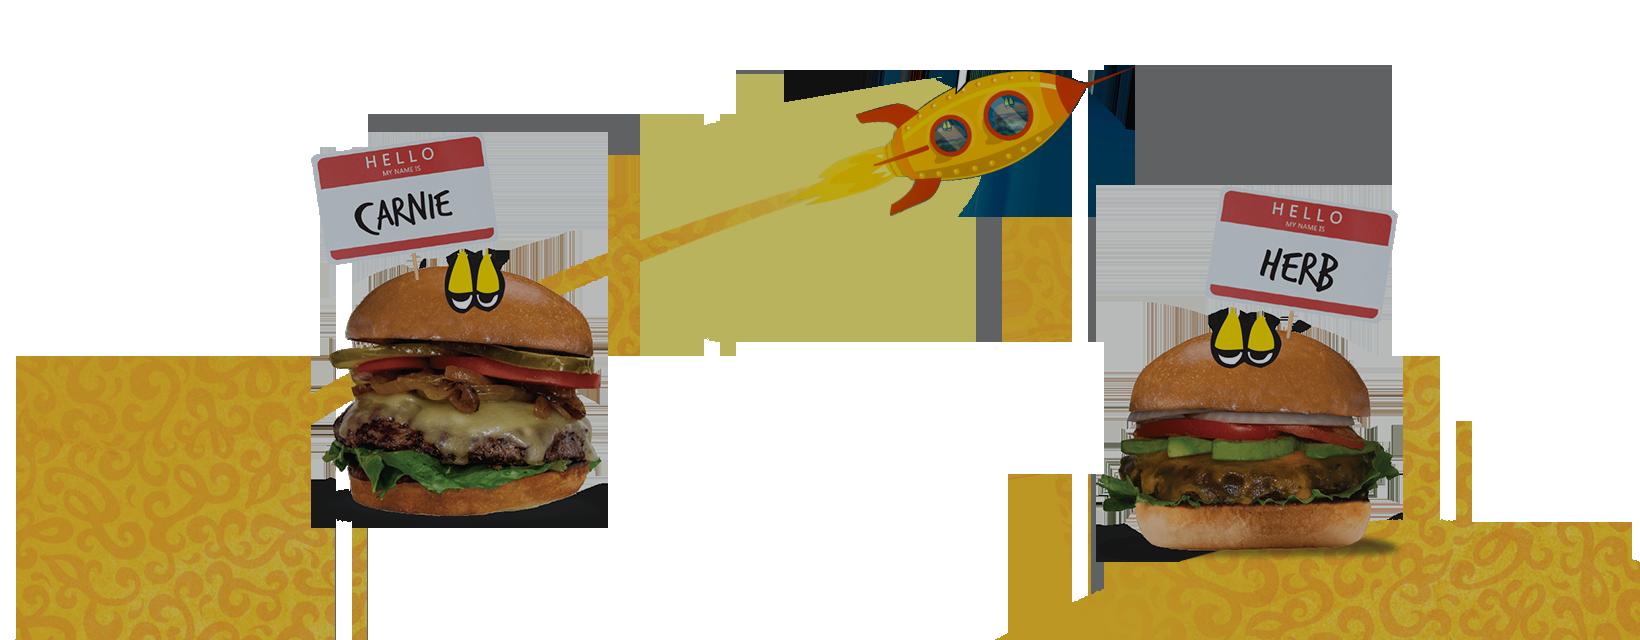 Mellow Mushroom Burger BFF